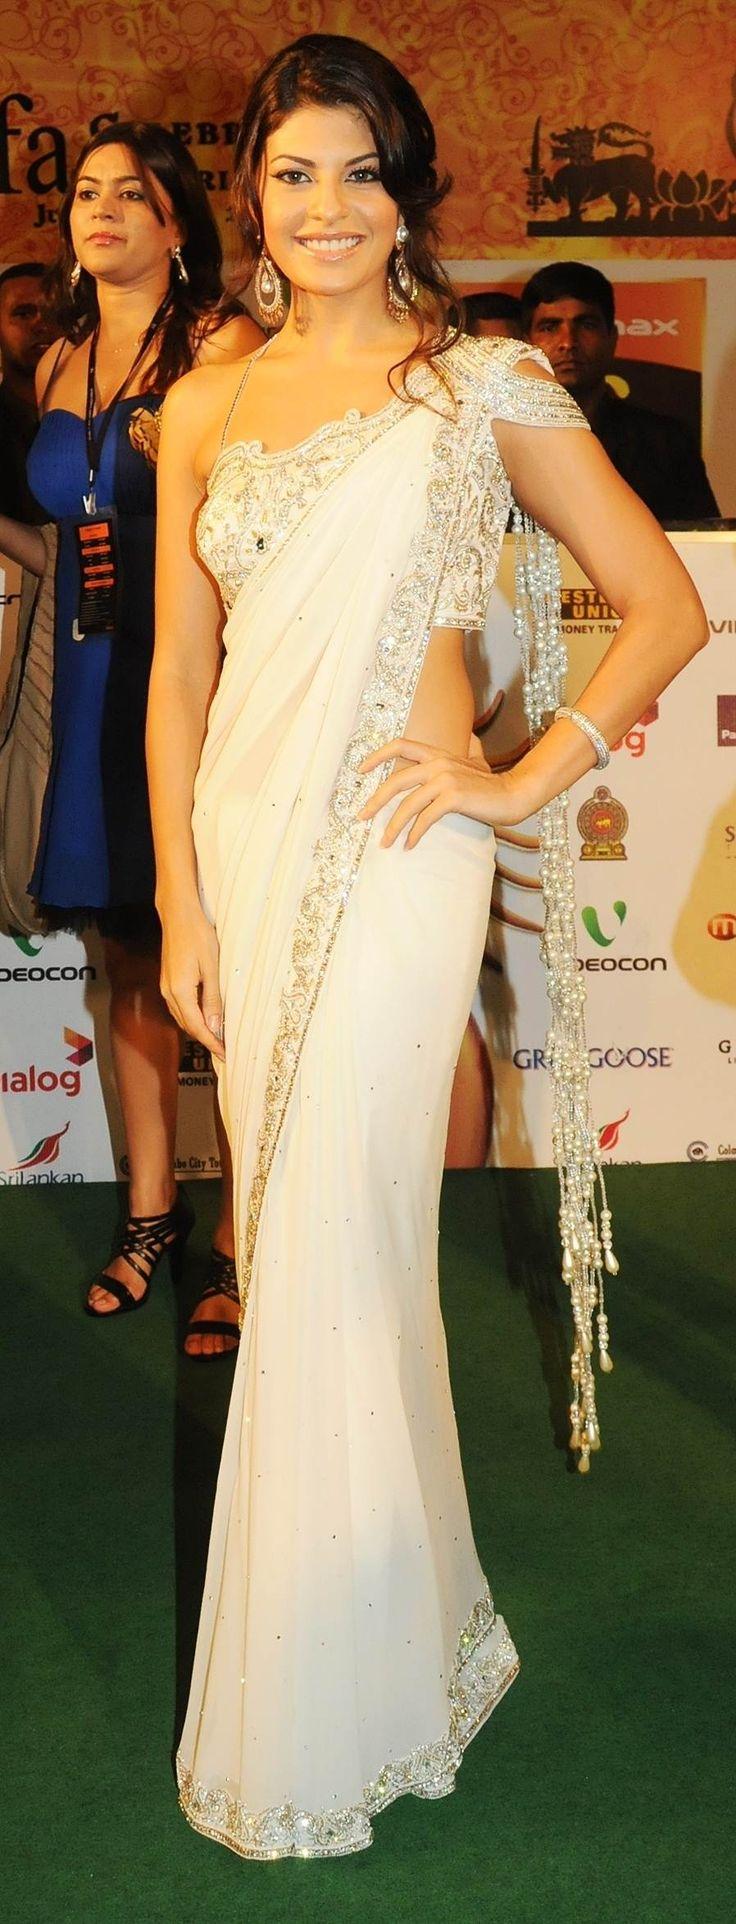 Former Miss Sri Lanka, Jacqueline Fernandez, in a Goorgeous White Sari – Simple yet elegant. #southasianfashion #sari #southasiancouture